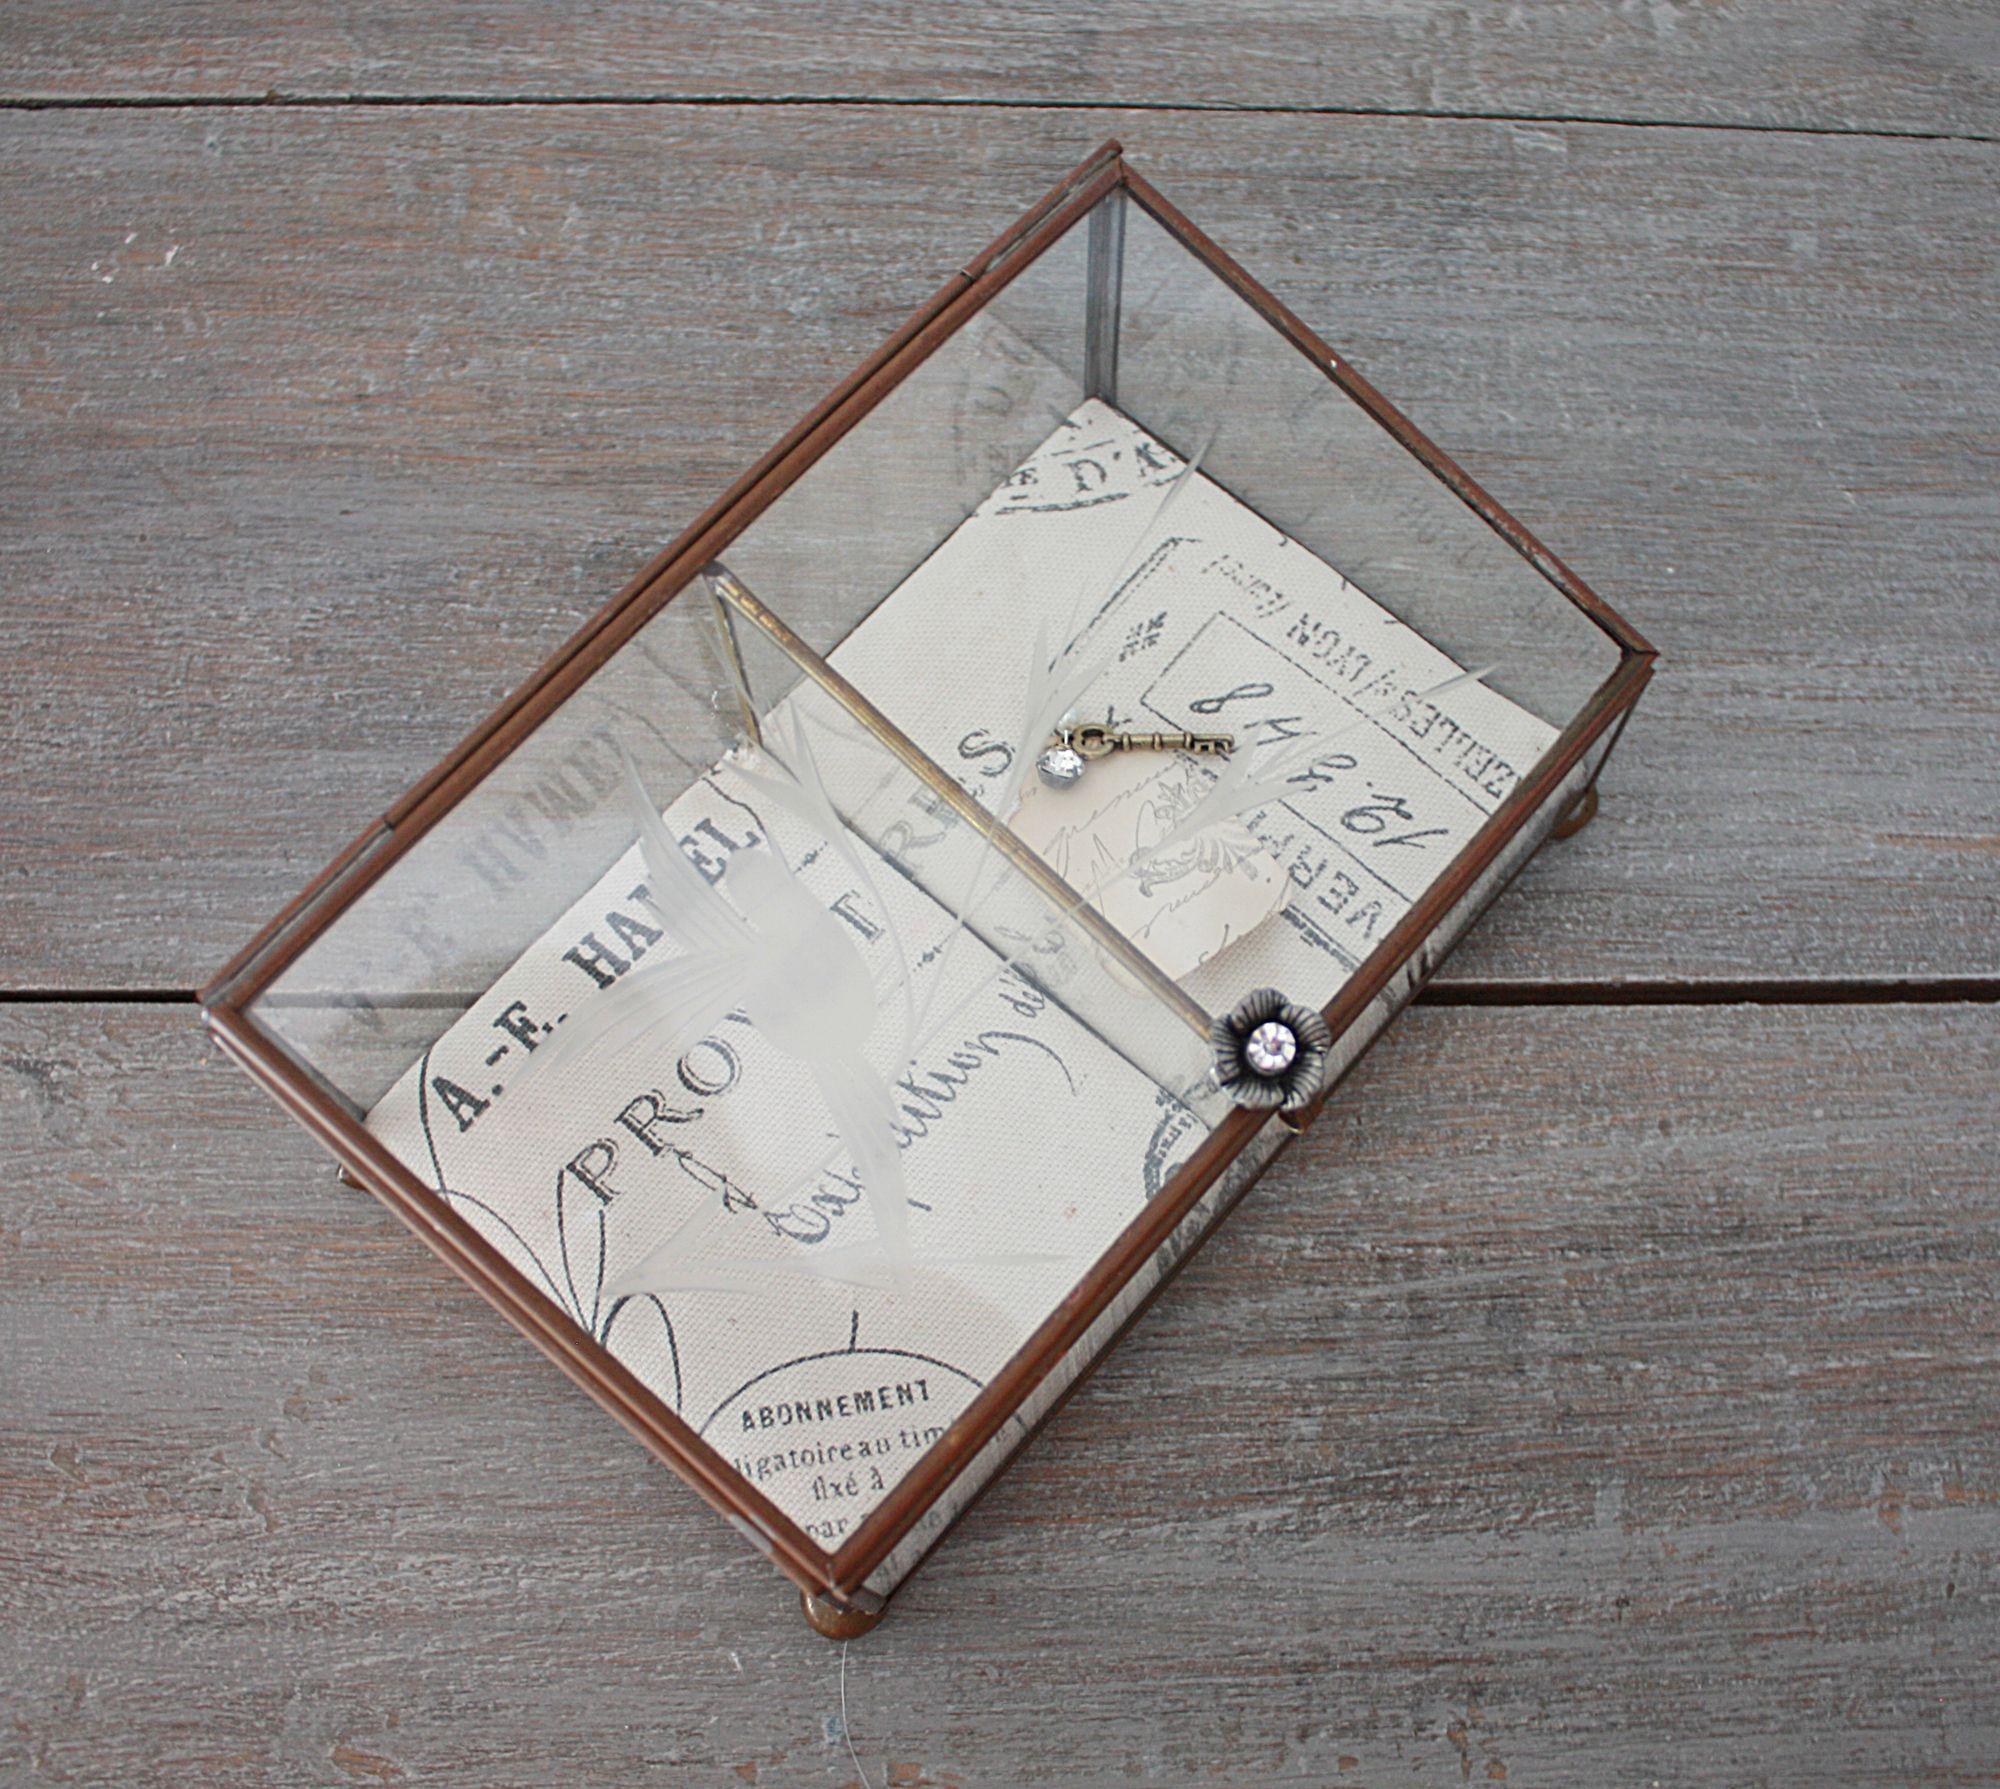 Vintage curiosity box | Cloth & Patina